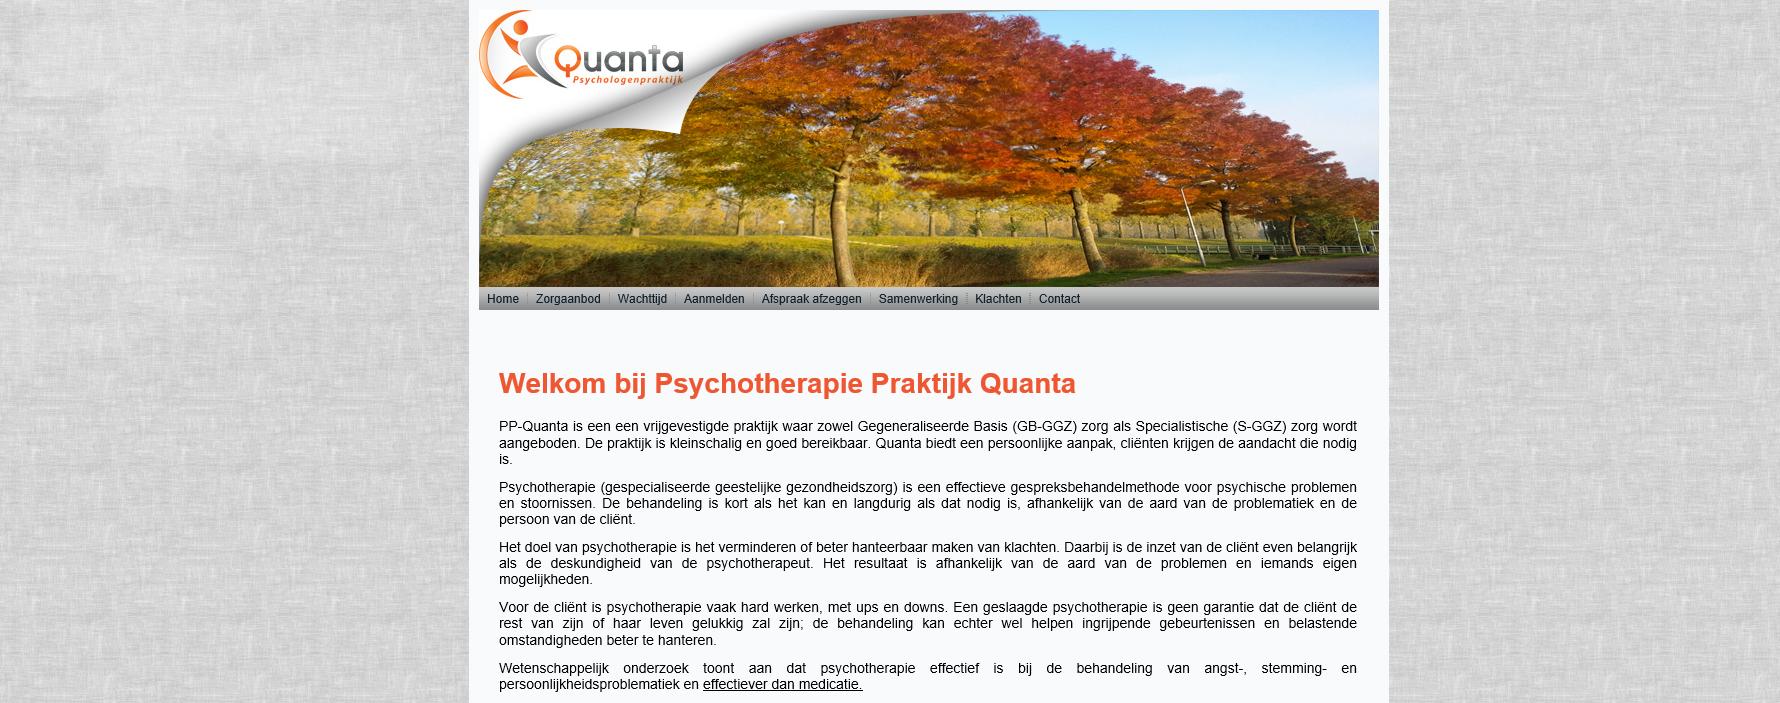 ppquanta